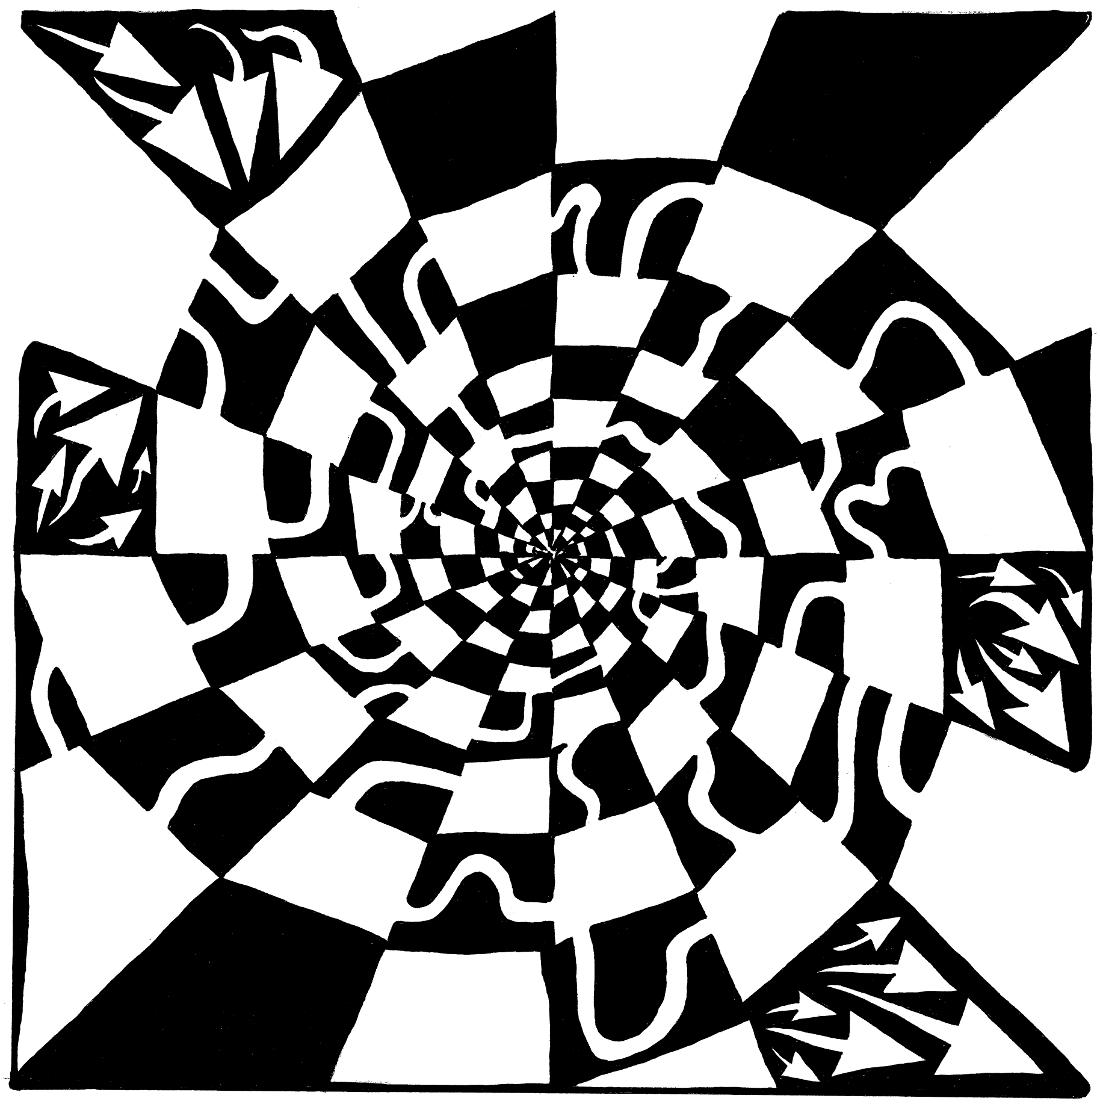 Spiral blender maze by Yonatan Frimer